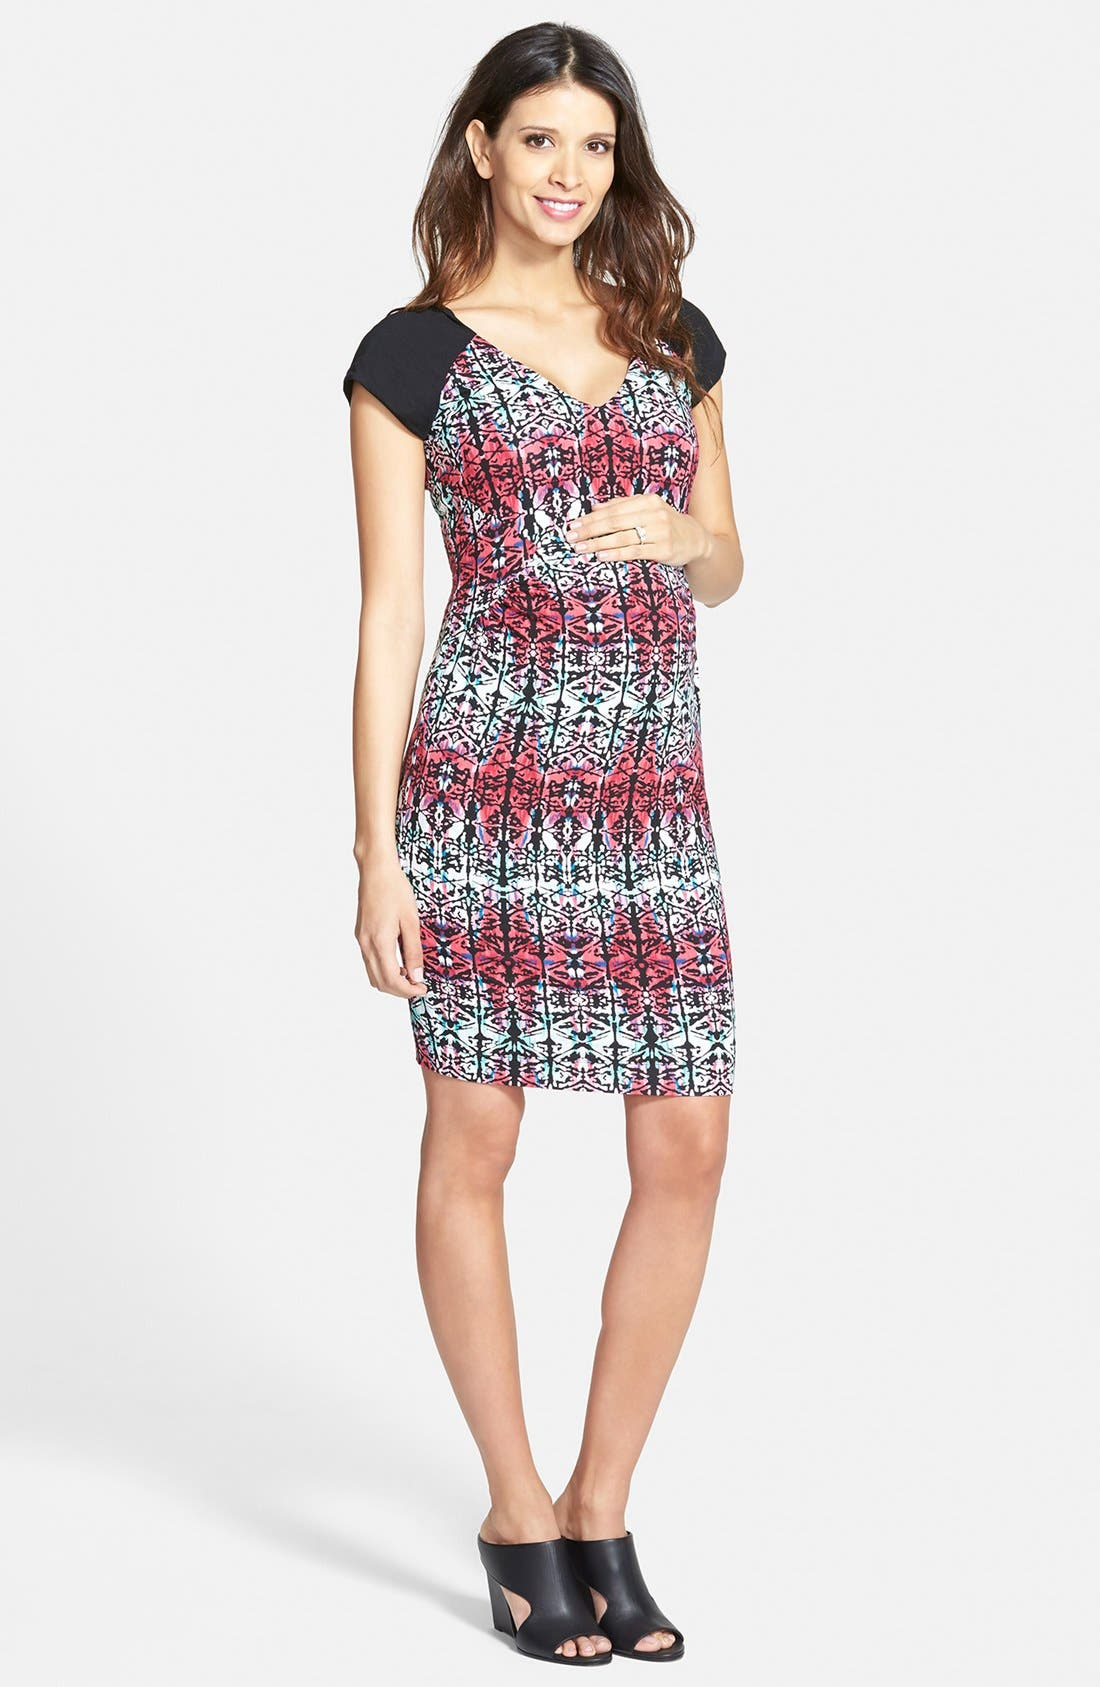 TART MATERNITY 'Freya' Print Body-Con Maternity Dress, Main, color, MOTLEY GEO